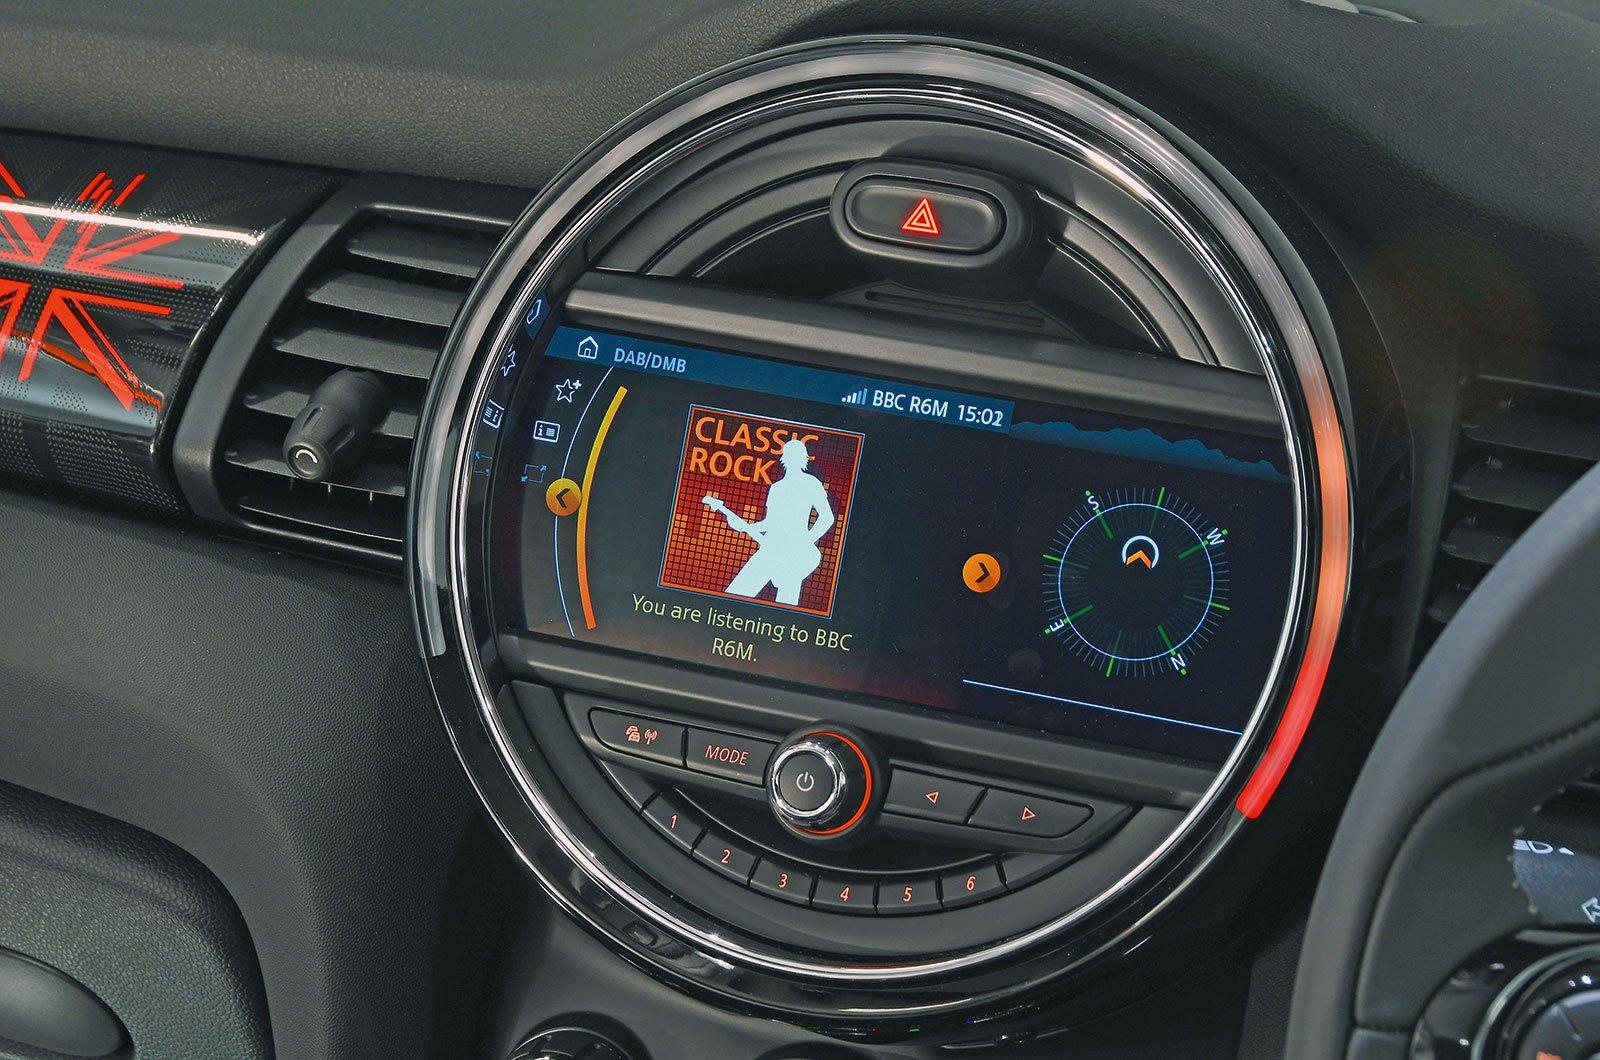 Mini hatchback infotainment screen